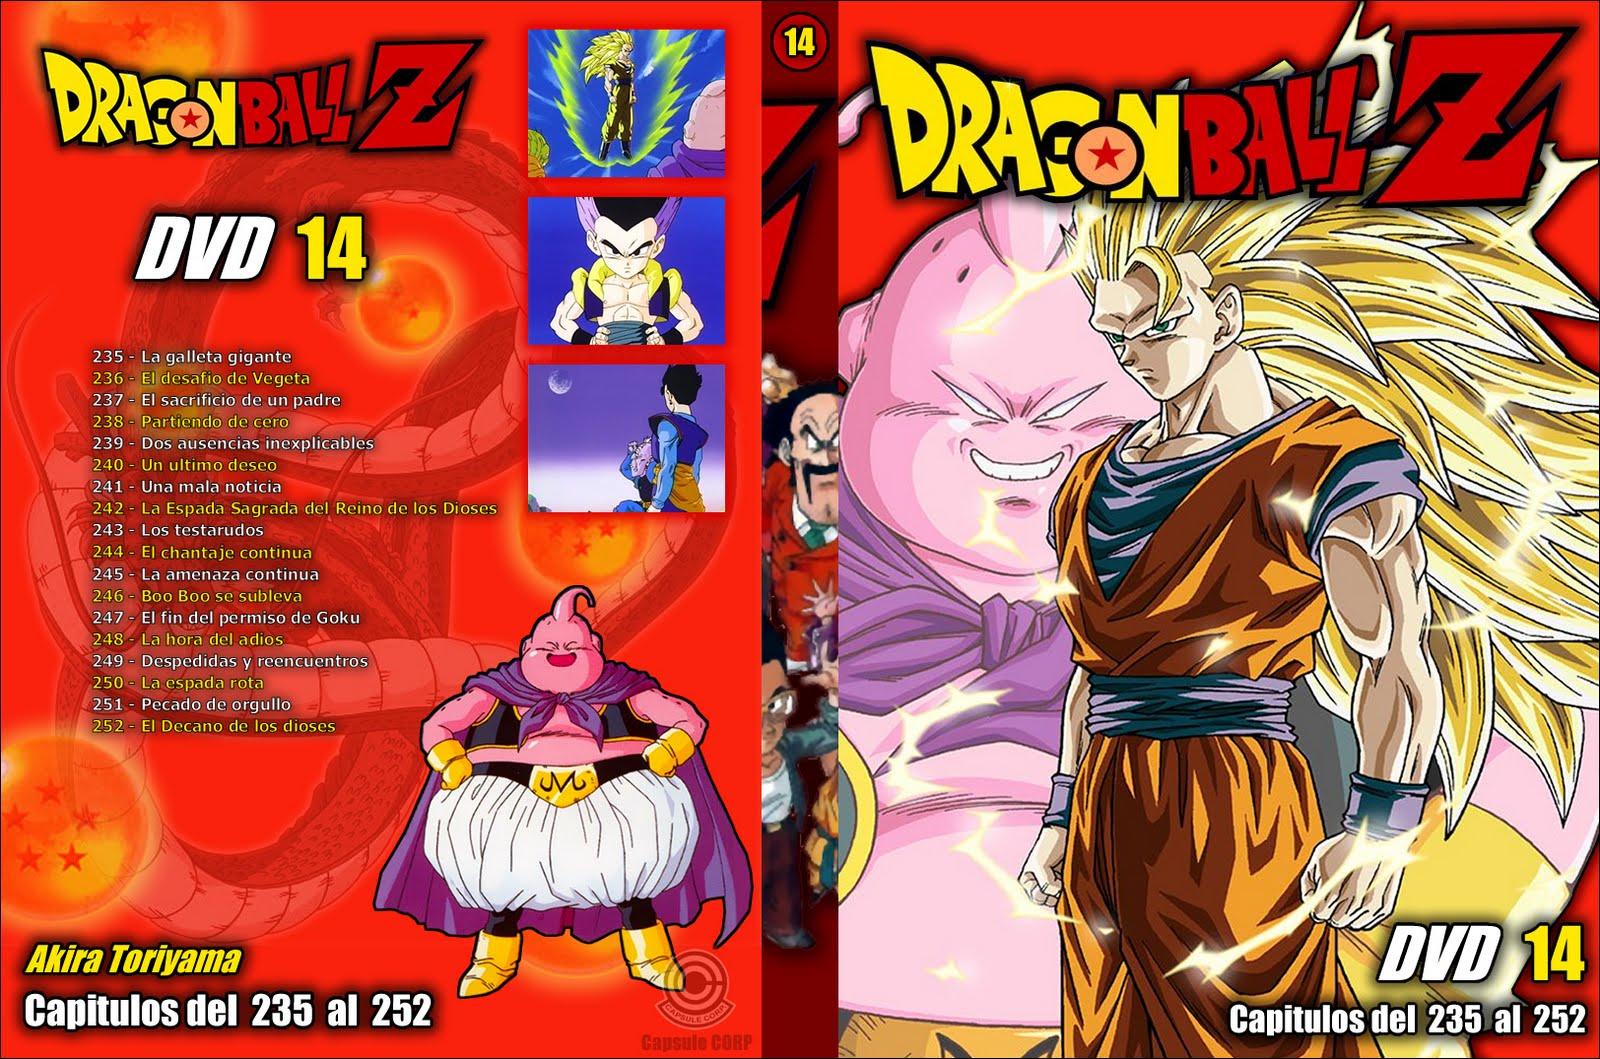 dragon ball z vol 14 Dragon ball z, vol 14 by akira toriyama (2003-12-03): akira toriyama: amazoncommx: libros amazoncommx prueba prime libros ir buscar hola.